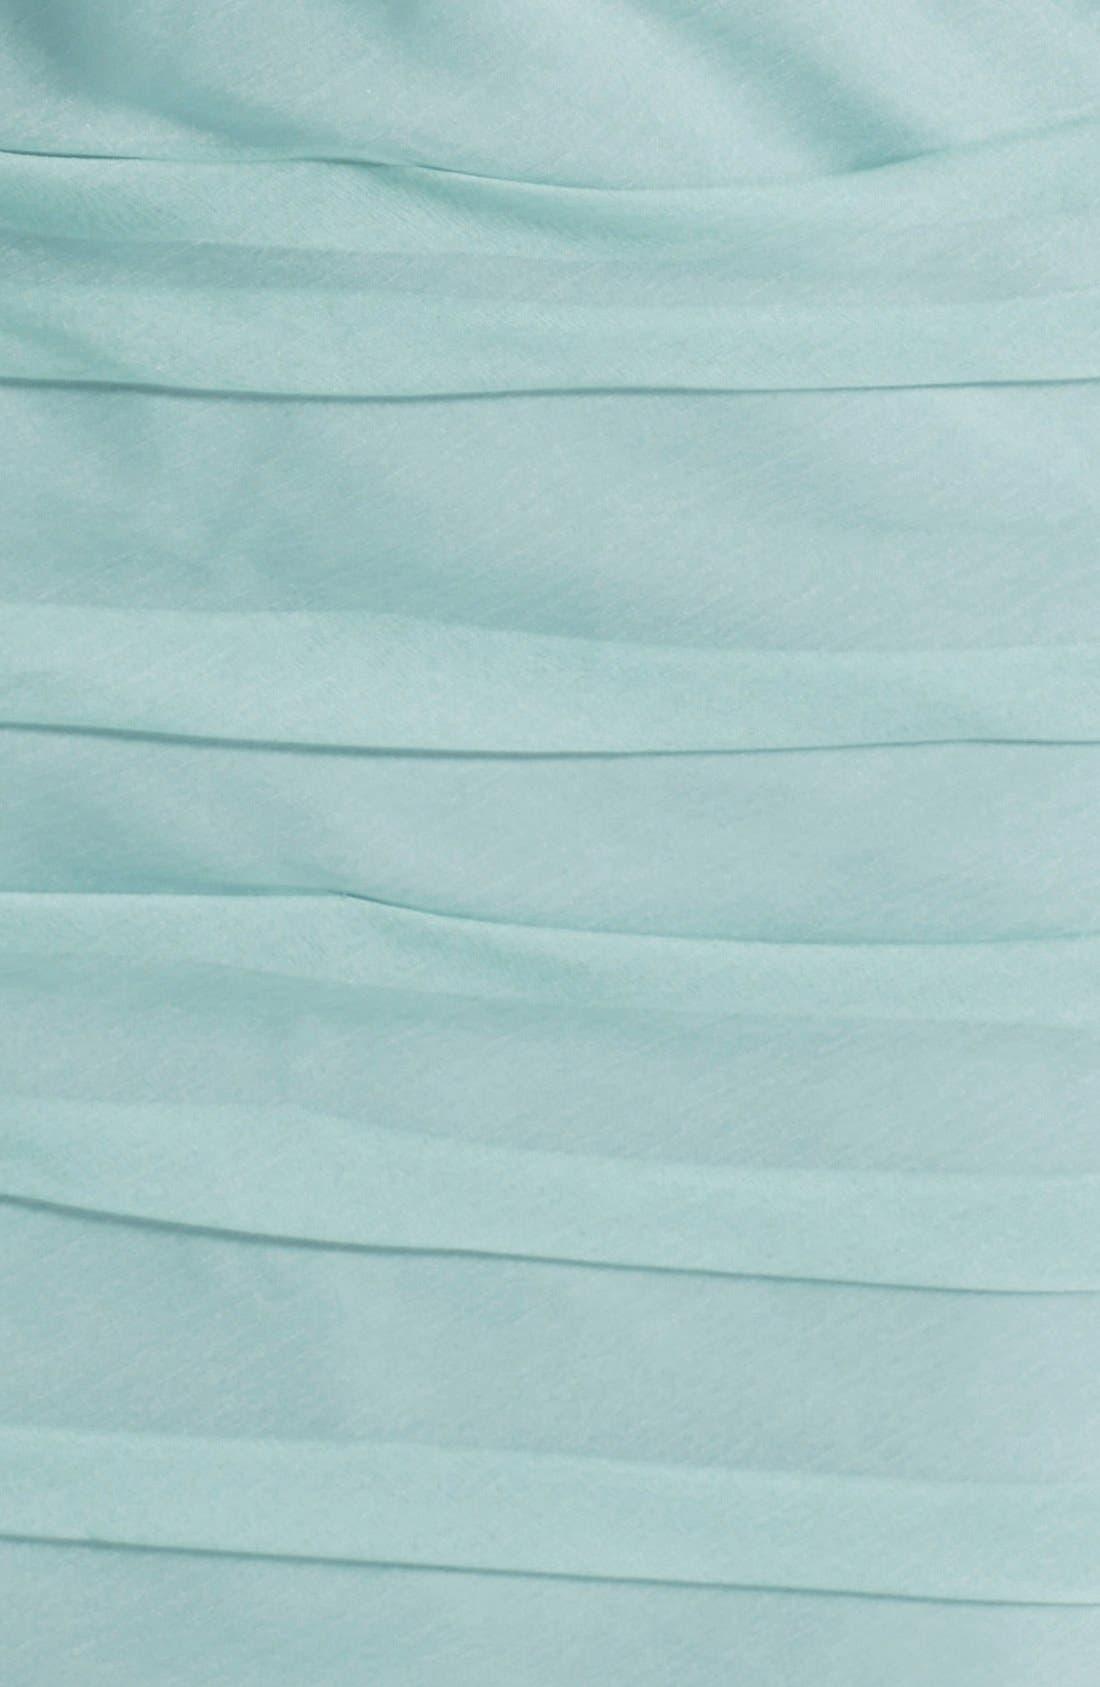 Alternate Image 3  - ML Monique Lhuillier Bridesmaids Ruched Strapless Cationic Chiffon Dress (Nordstrom Exclusive) (Plus Size)